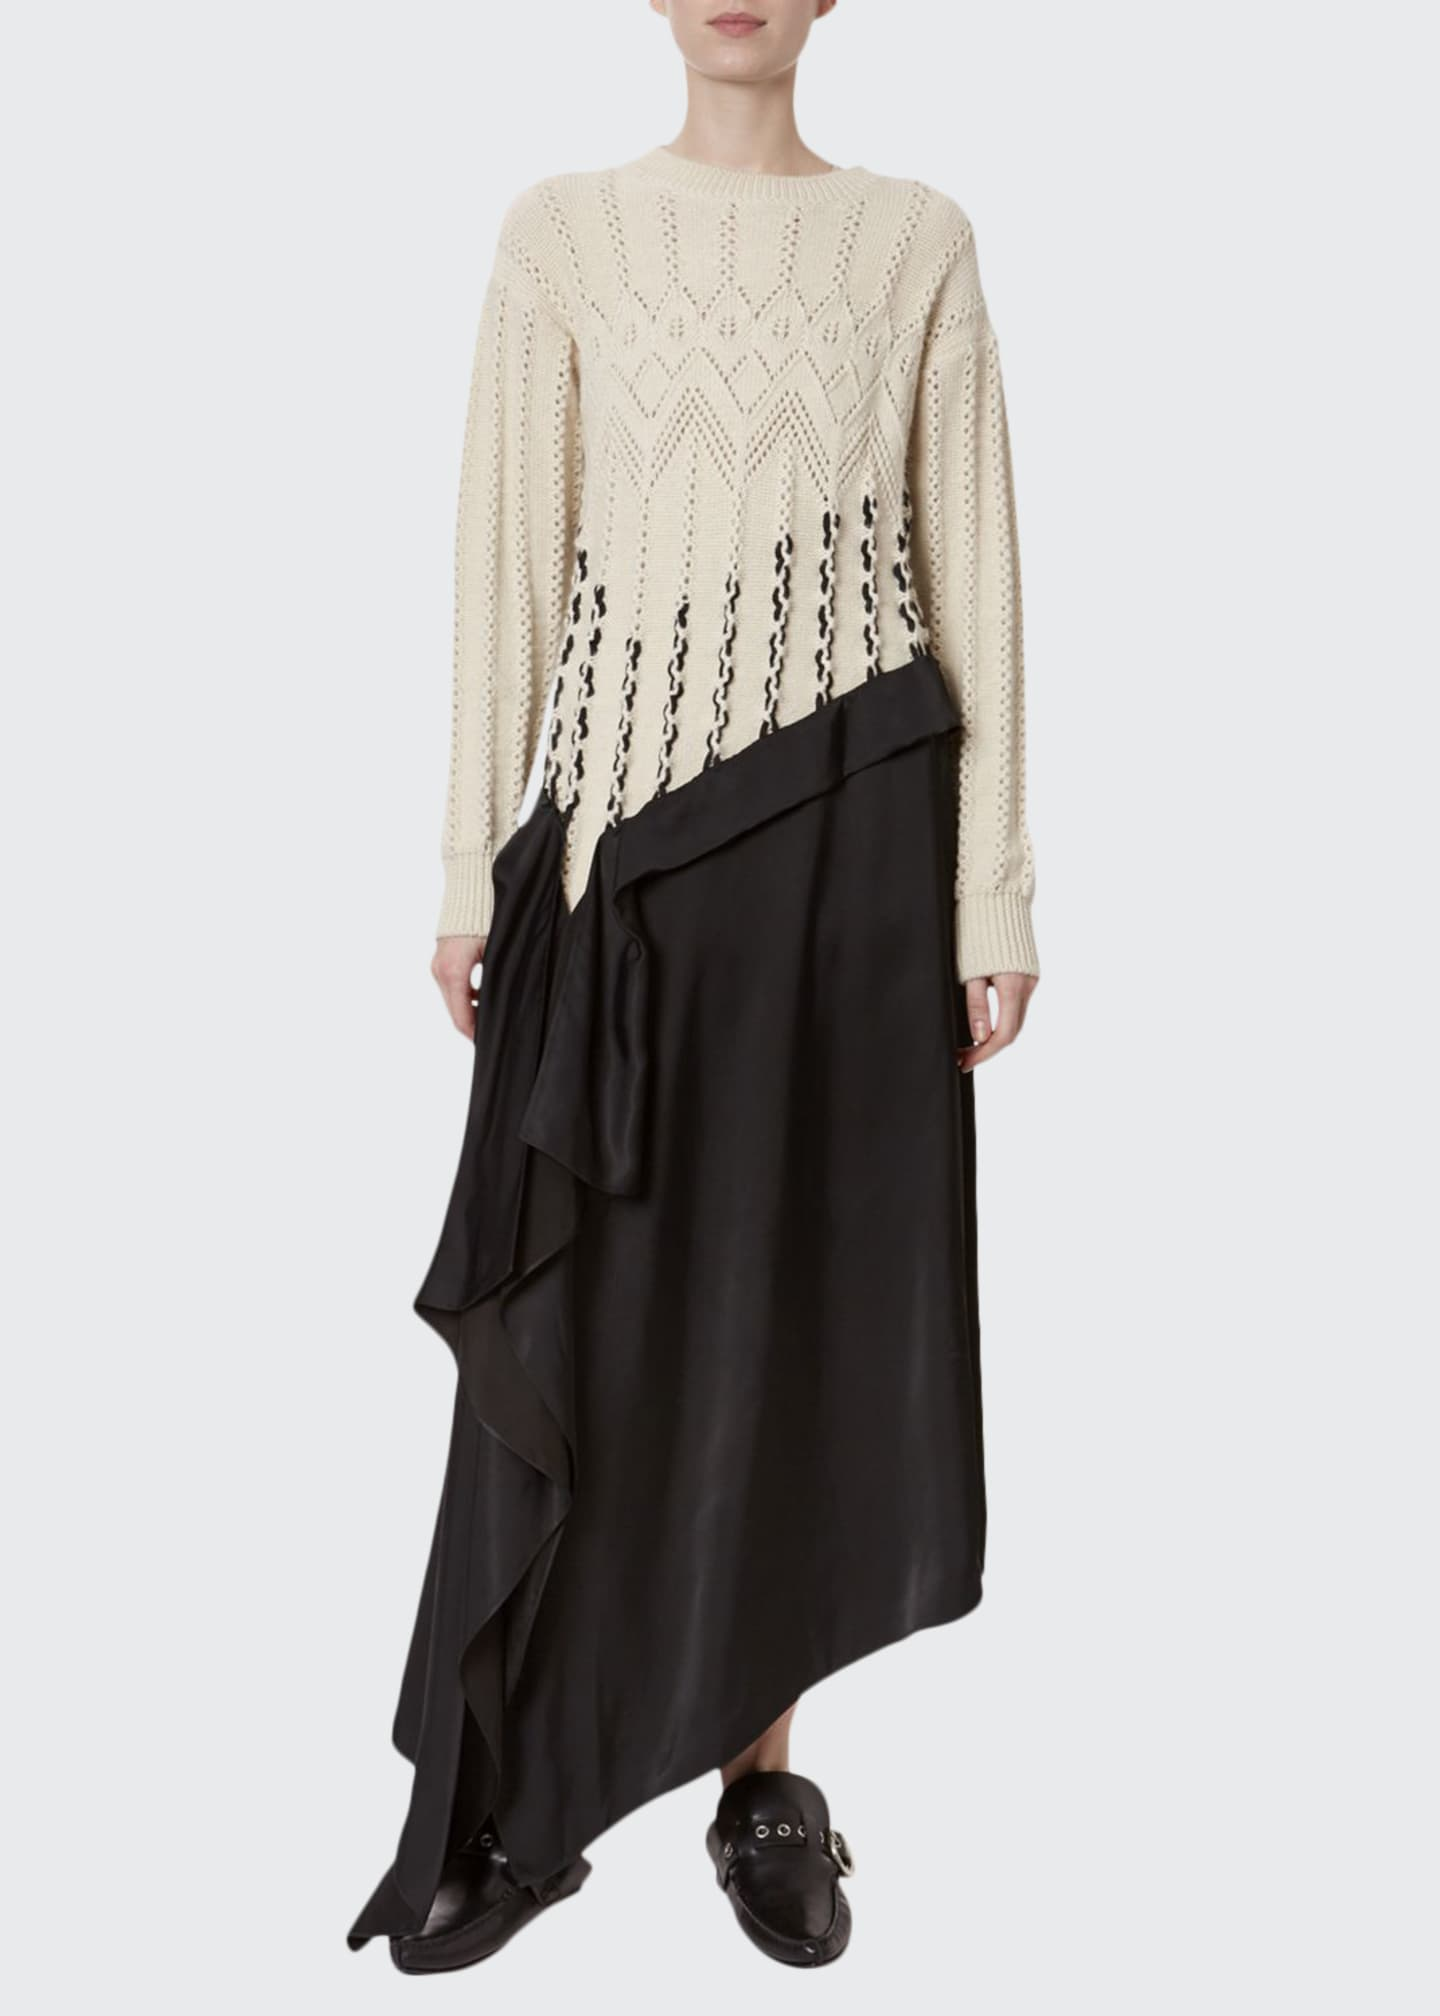 Loewe Satin-Hem Cable-Knit Dress